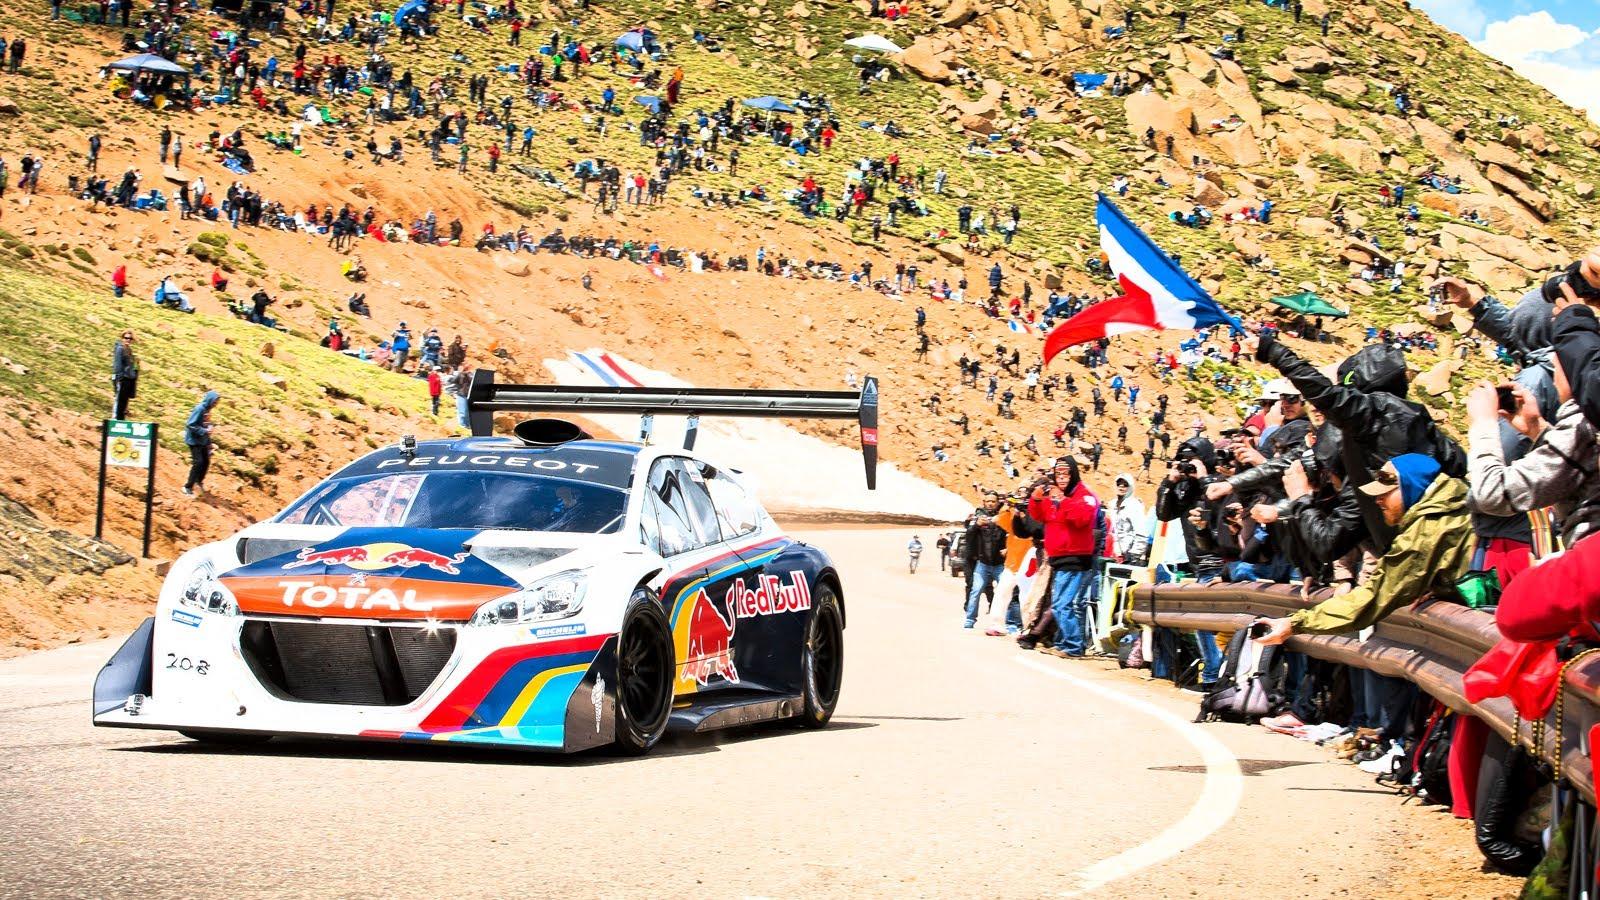 Sebastien Loeb bateu o recorde de famosa subida de Pikes Peak